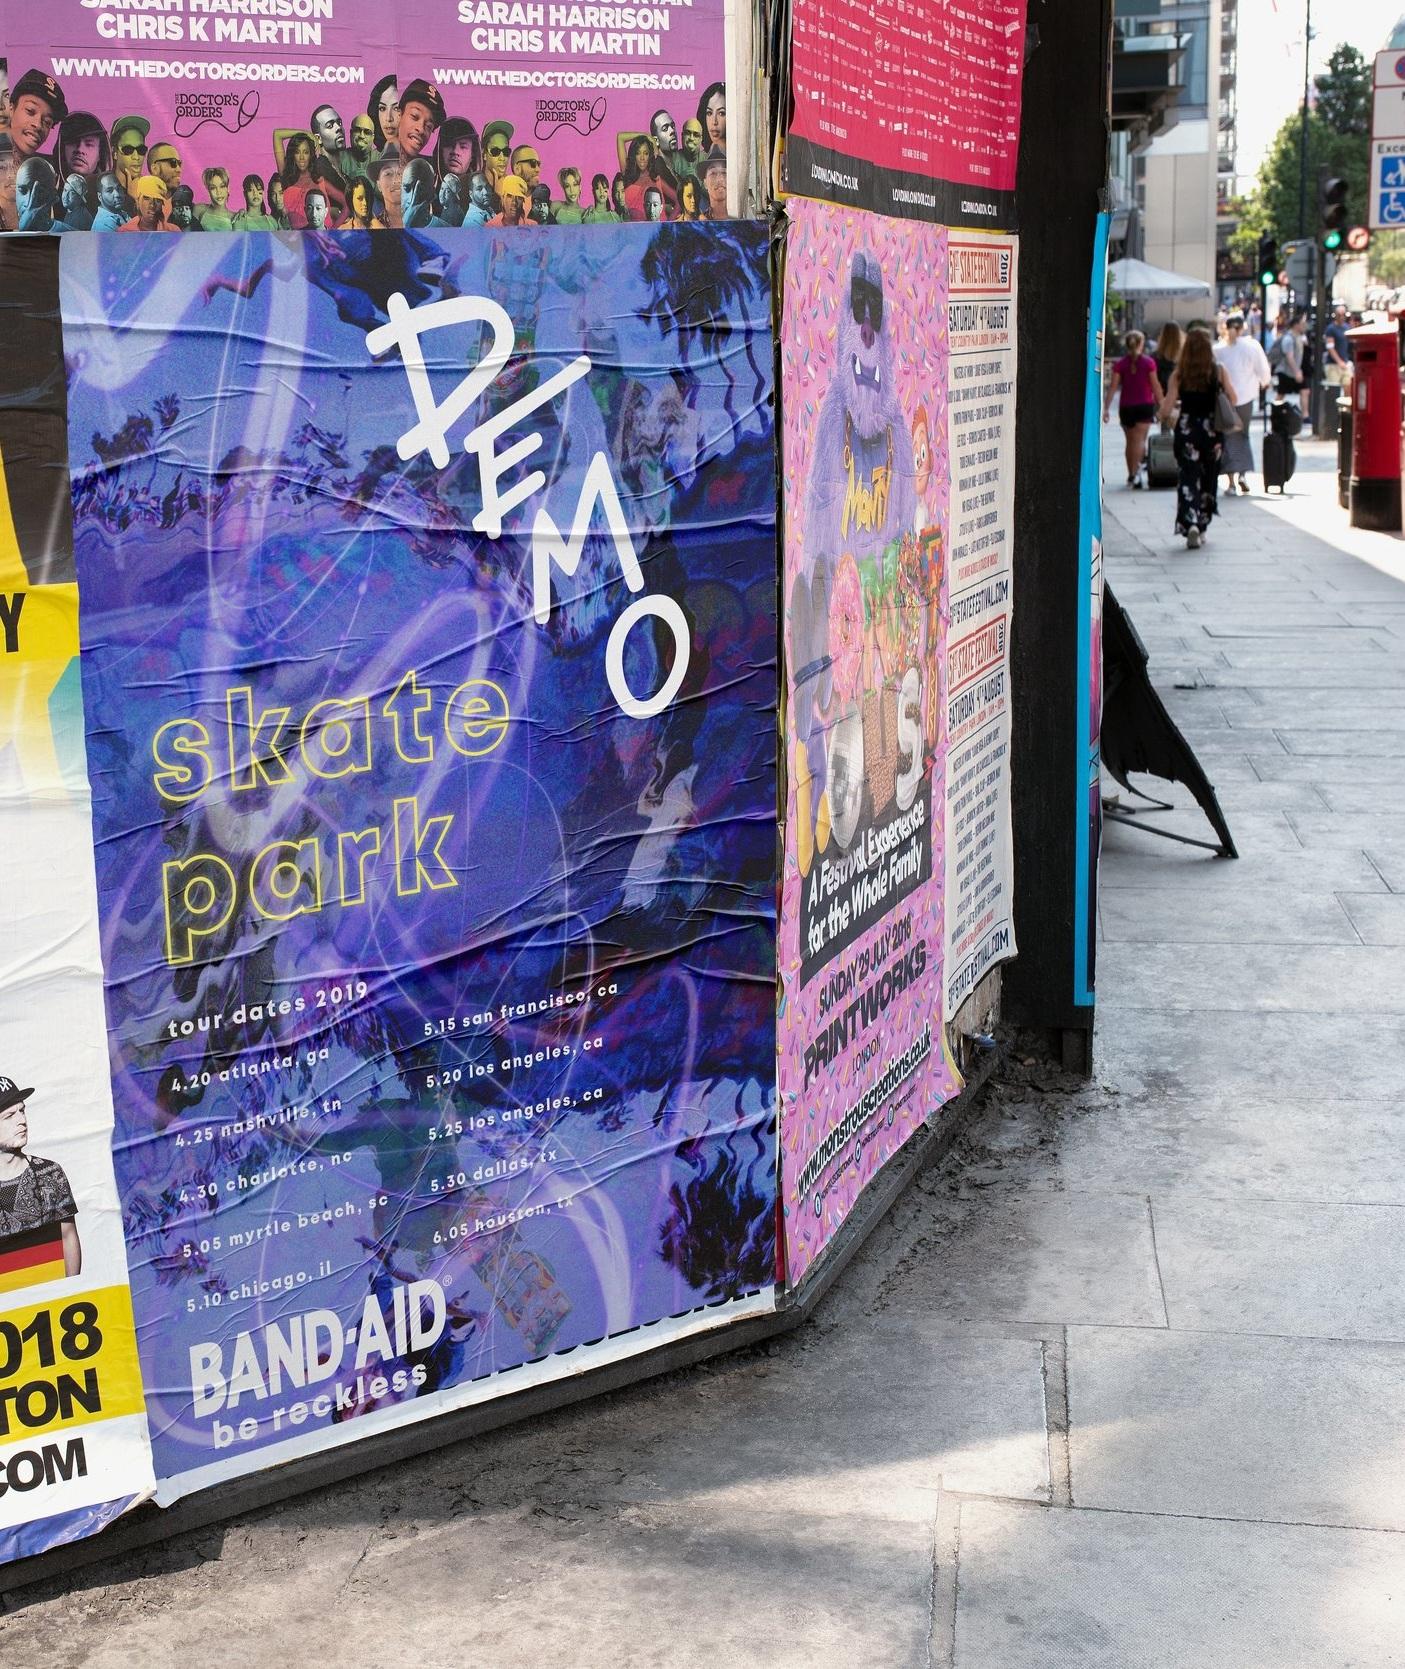 bandaid+poster+2+%281%29+2.jpg